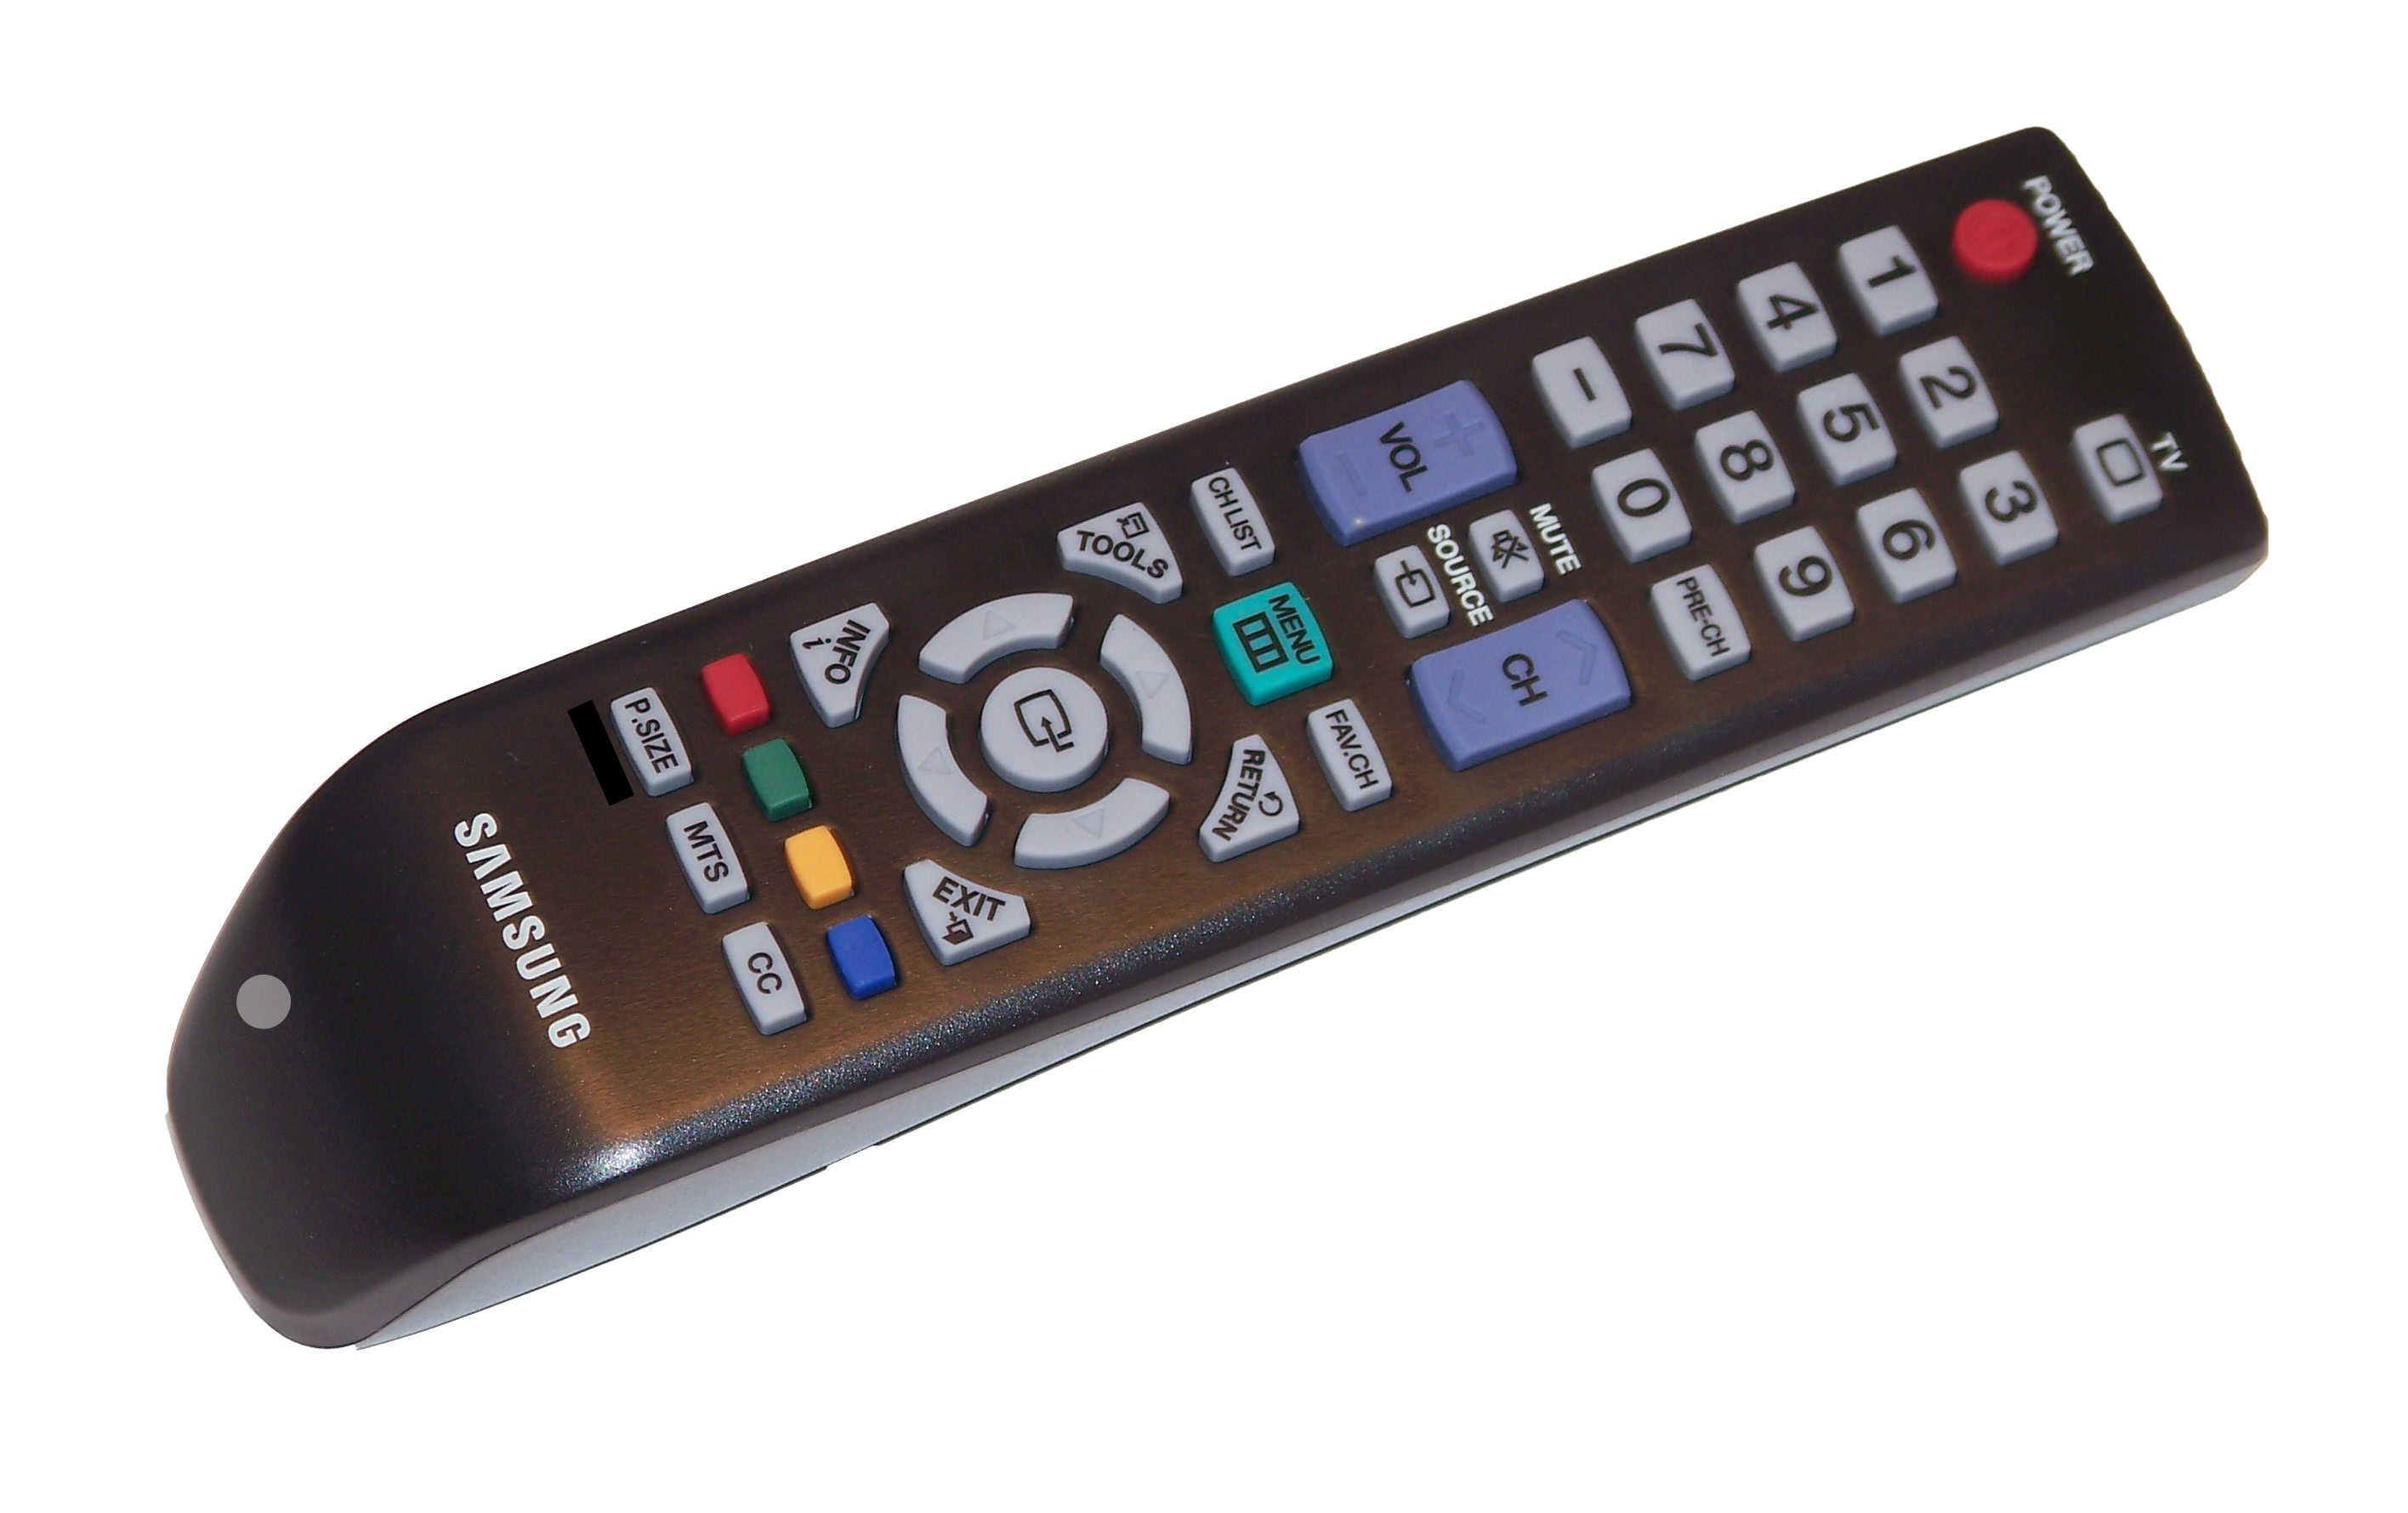 NEW OEM Samsung Remote Control Specifically For LN26B450C4XZS, LA32C350D1